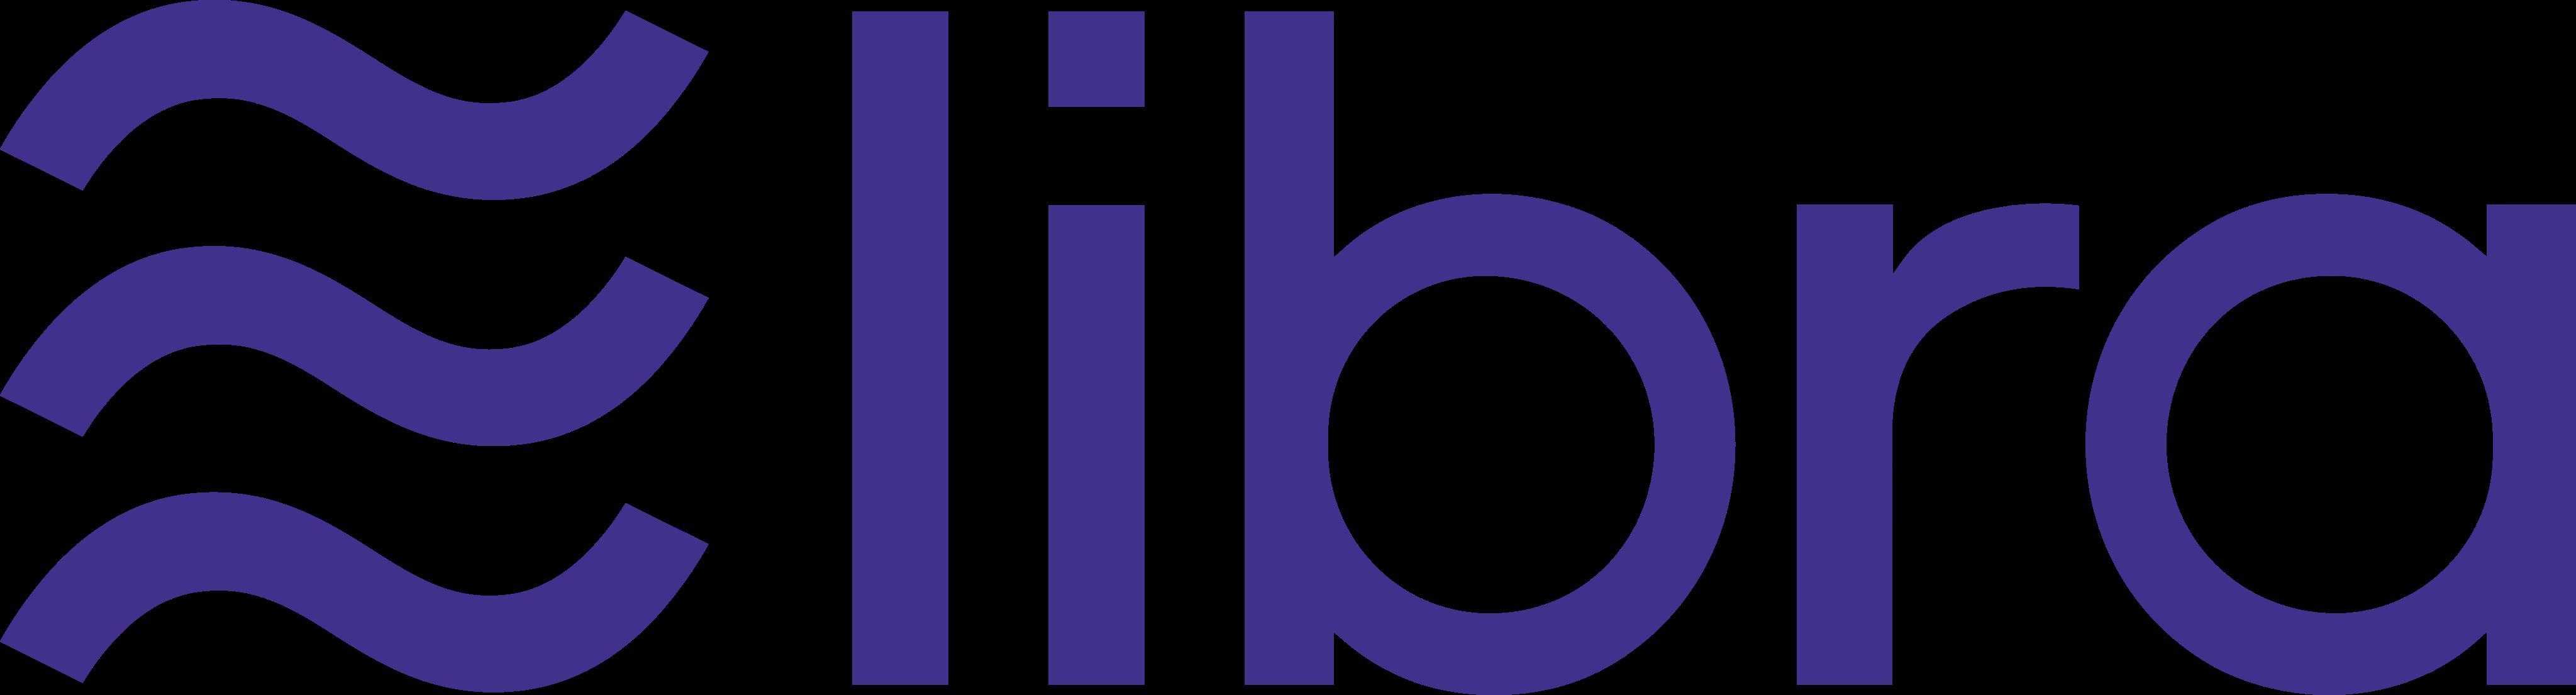 ELI5 Facebook Libra Cryptocurrency